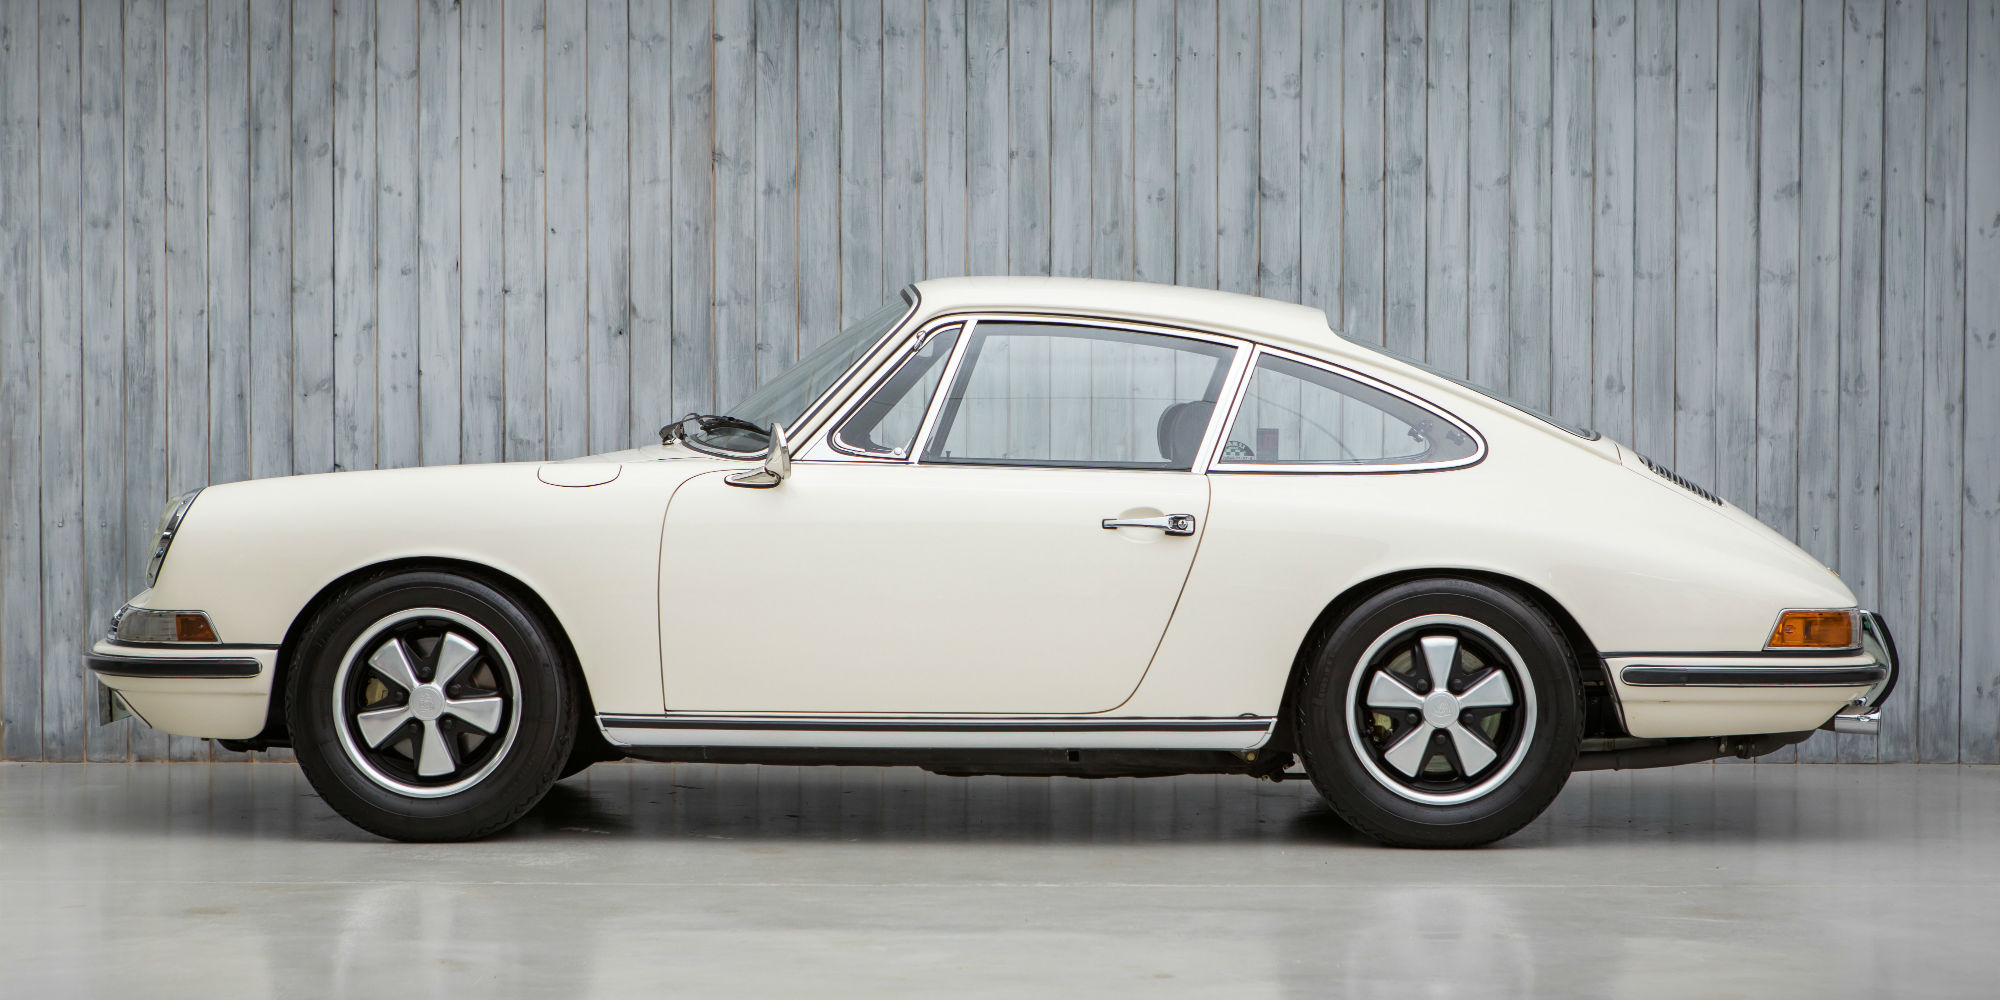 1968 Porsche 911S 2.0 SWB